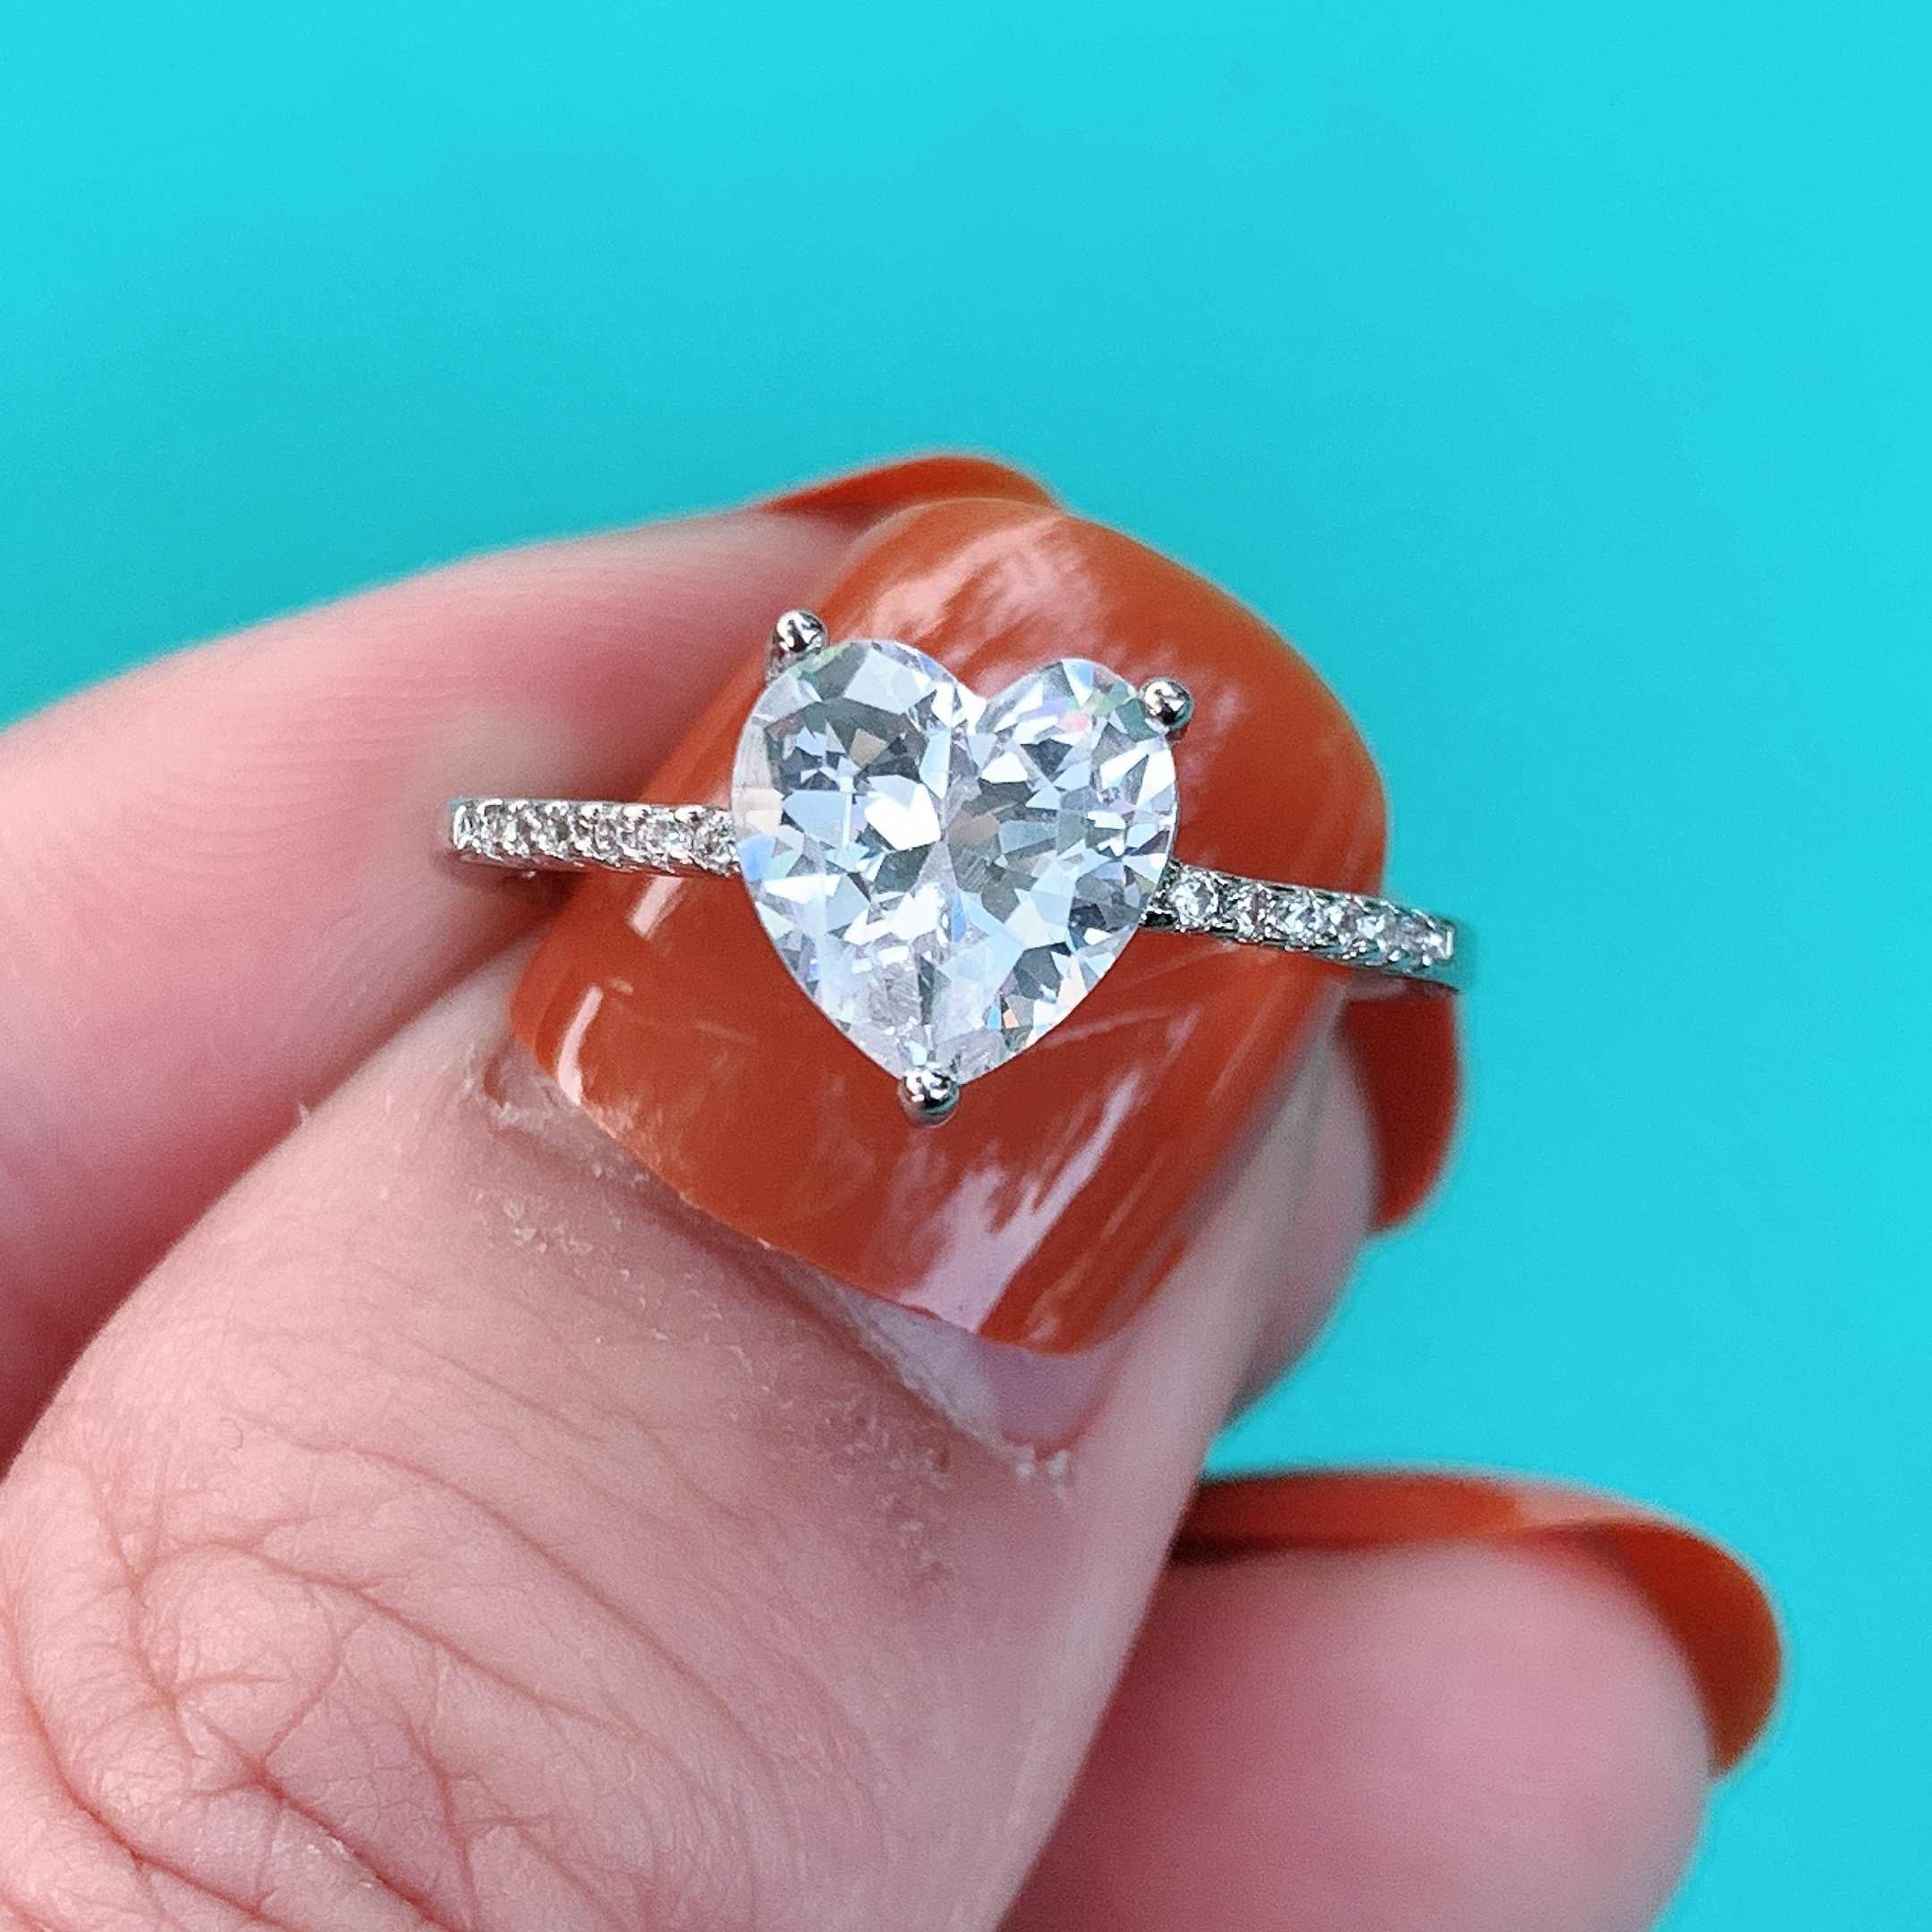 Vecalon לב מבטיחים טבעת אמיתי 925 סטרלינג כסף 1ct AAAAA Cz אירוסין נישואים טבעות לנשים כלה תכשיטי מפלגה